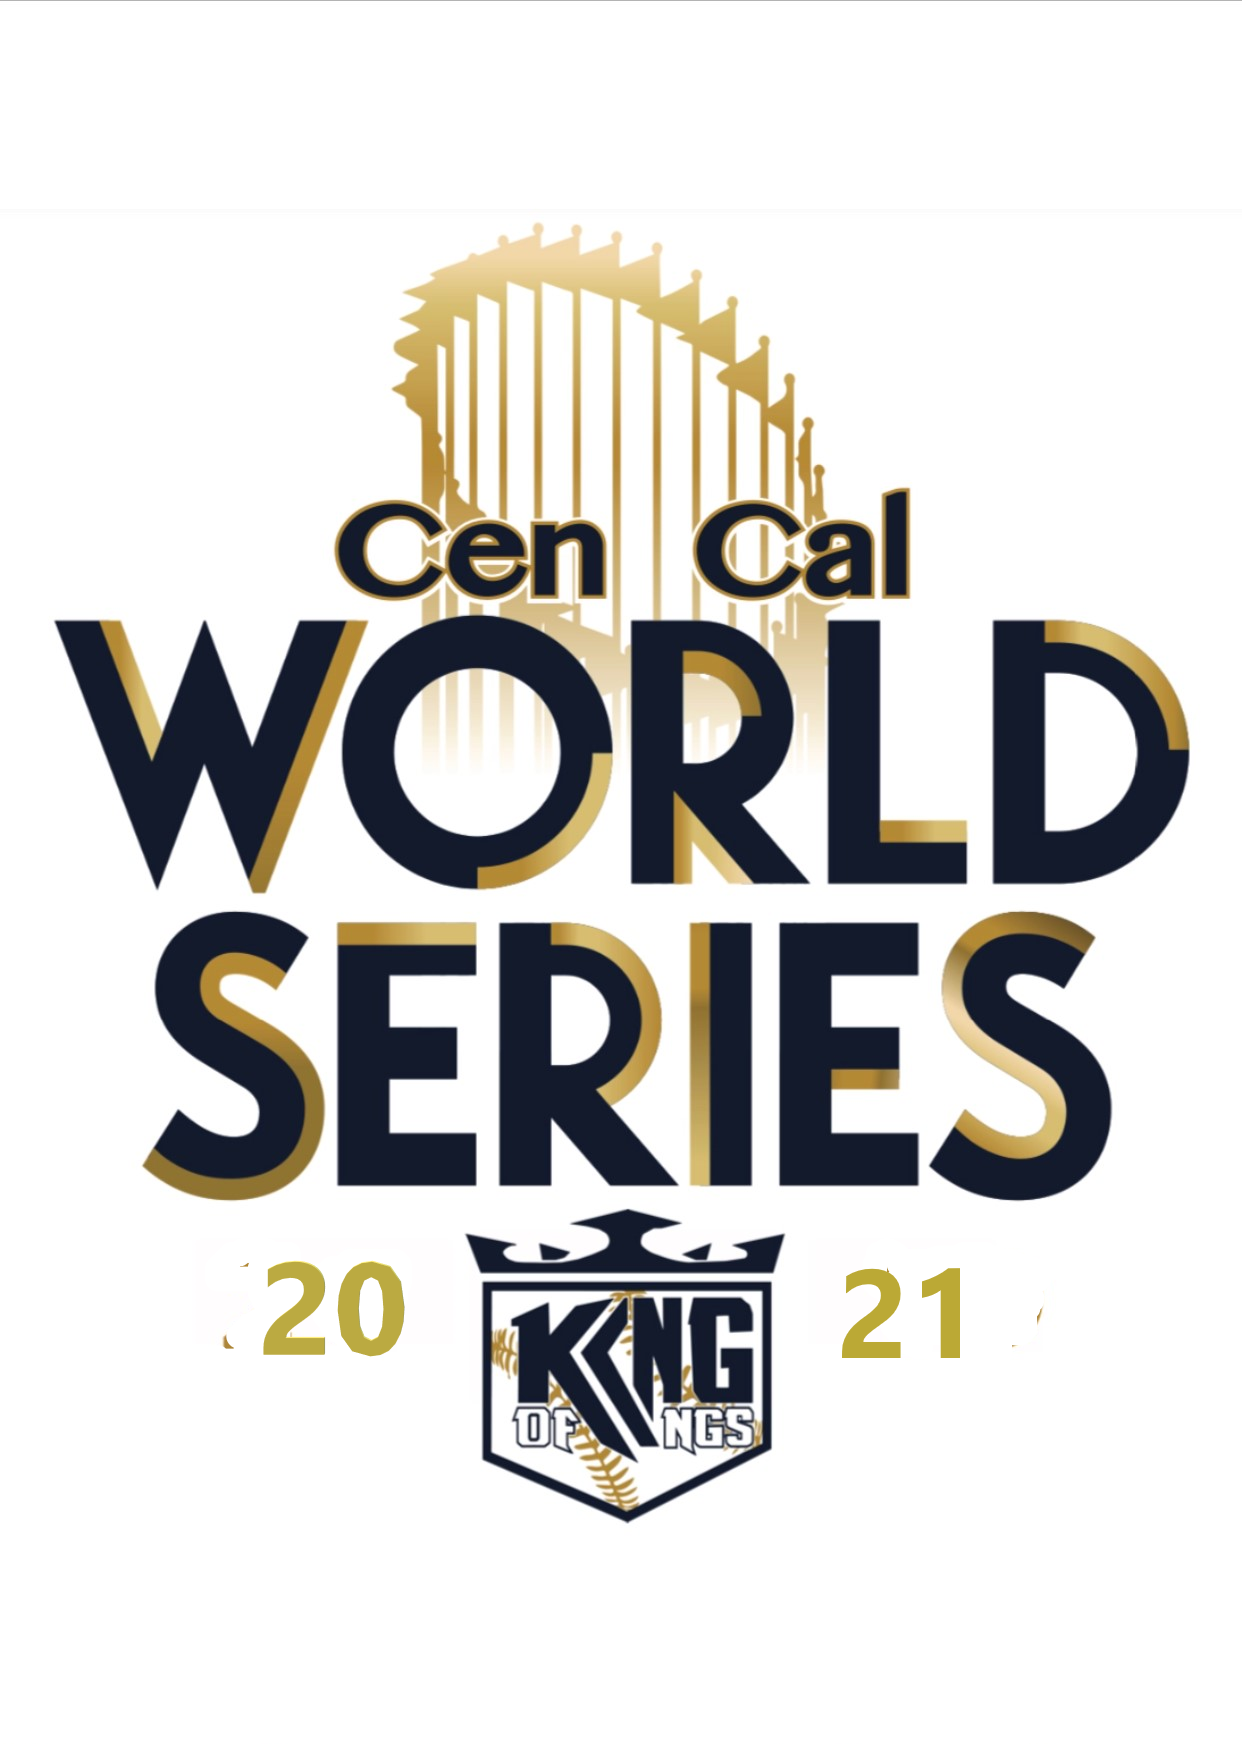 Cen Cal World Series 2021 Logo